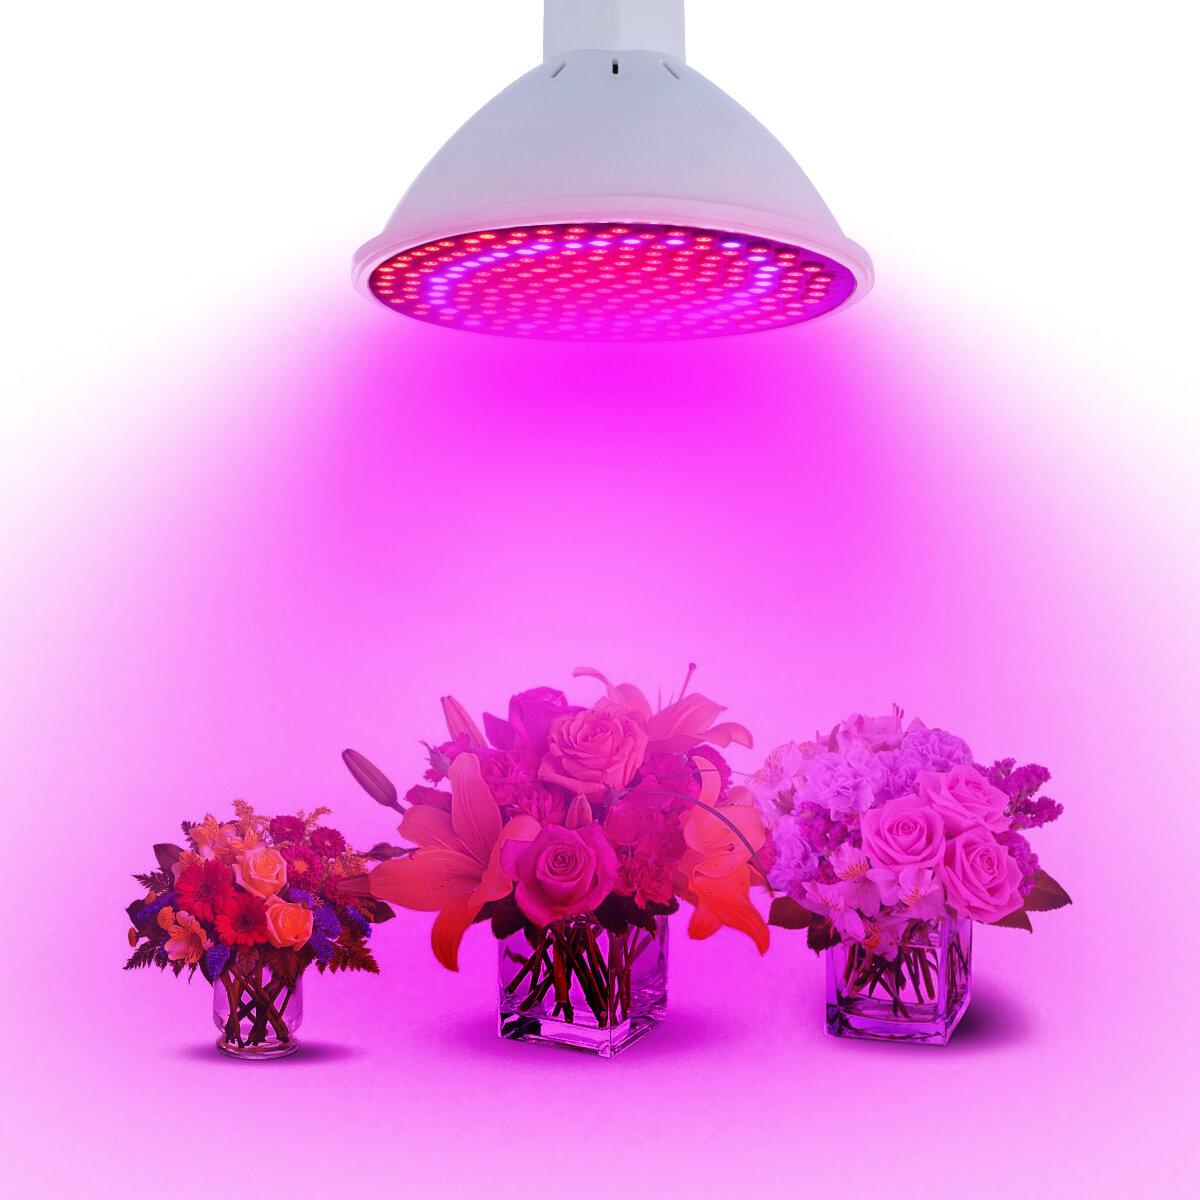 20W E27 166 Red 34 Blue LED Grow Light Plant Lamp Bulb Garden Greenhouse Plant Seeding Light